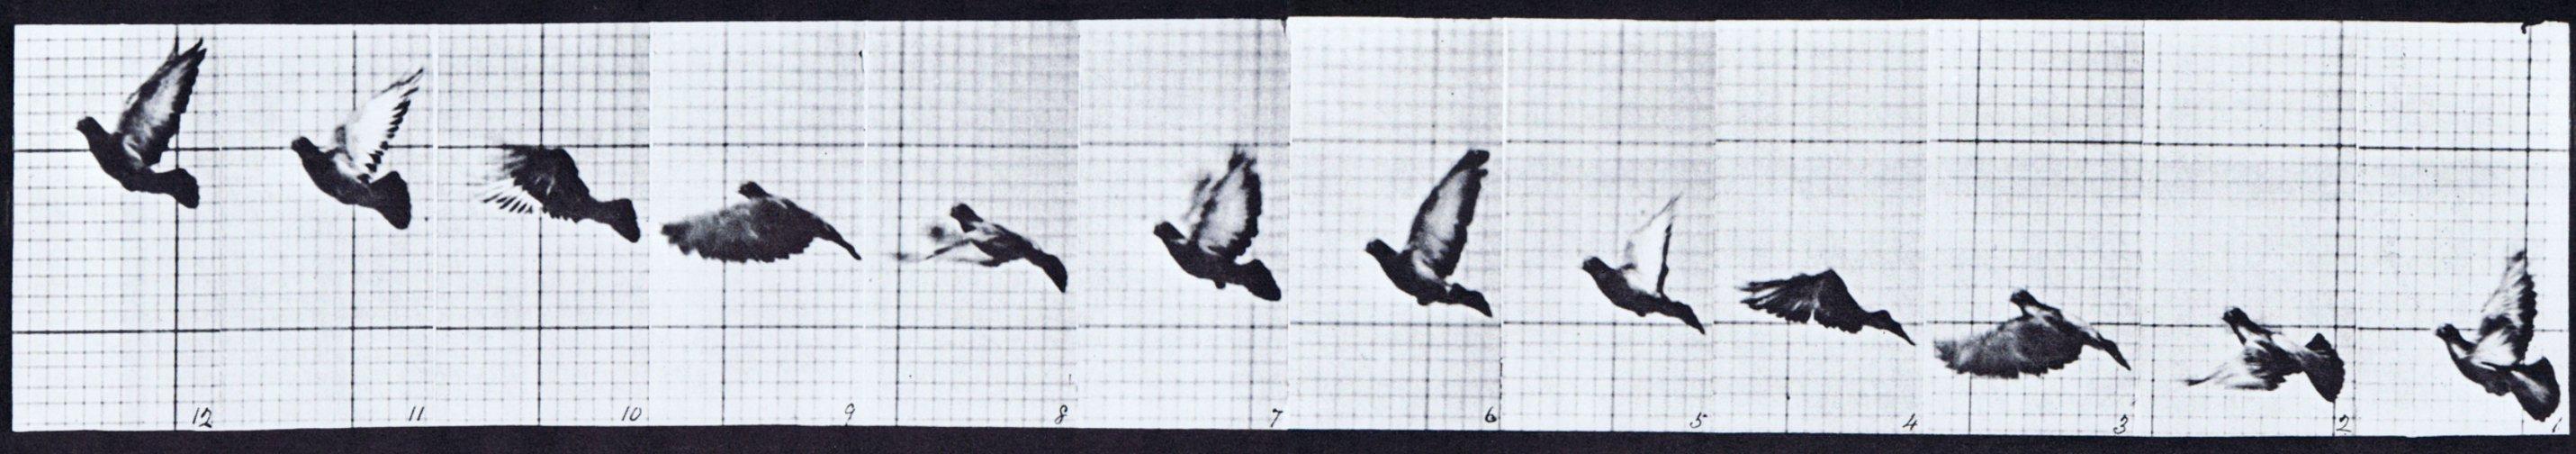 Identifying Similar Images with TensorFlow